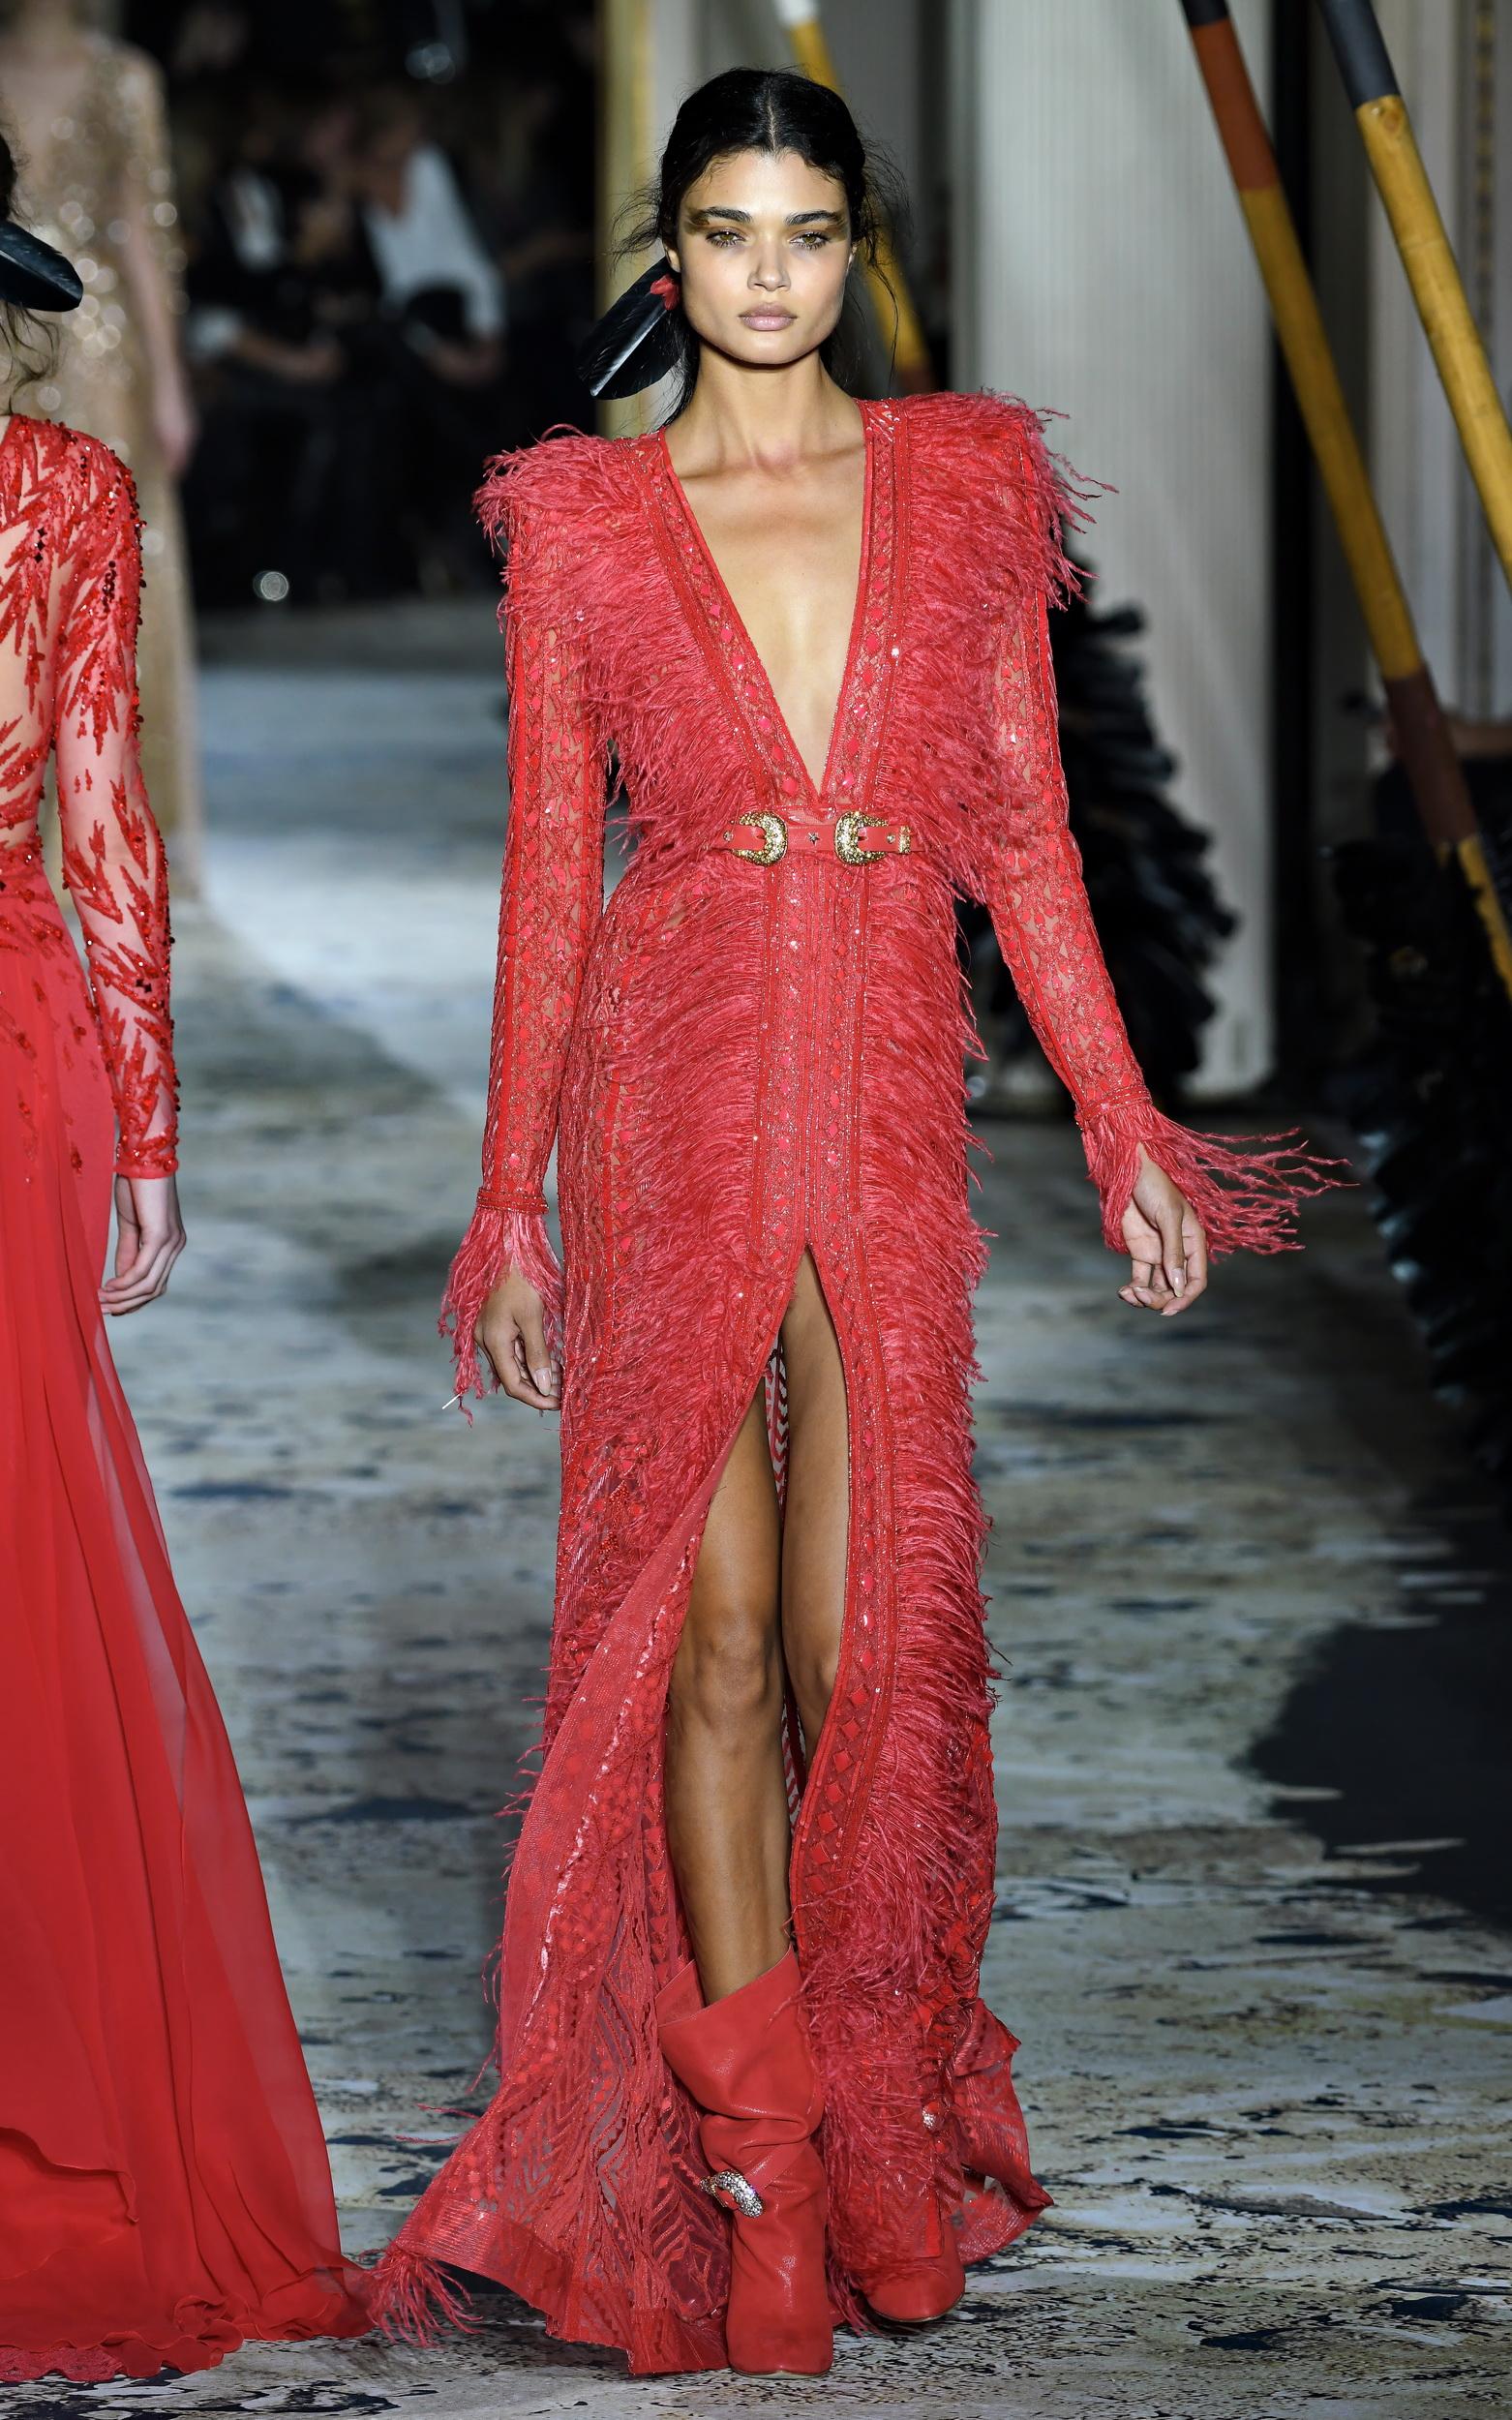 Paris Haute Couture SS 2018 Zuhair Murad 4to4u Arthur Koff 11.JPG